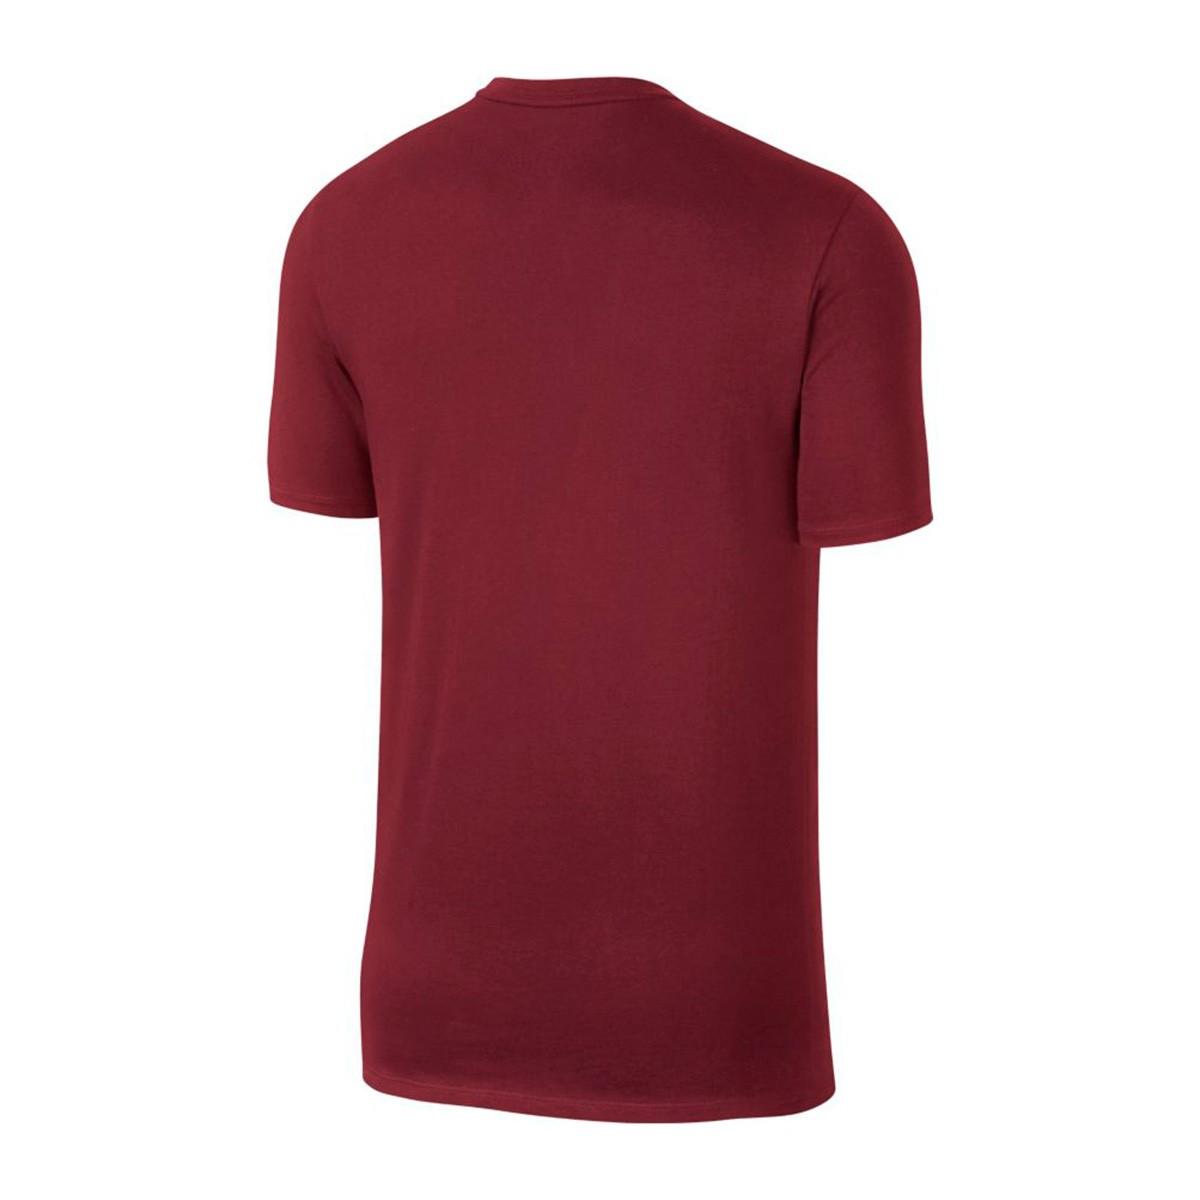 40d45b5a27de2 Jersey Nike Nike F.C. Swoosh Flag Team red-Metallic gold - Football ...